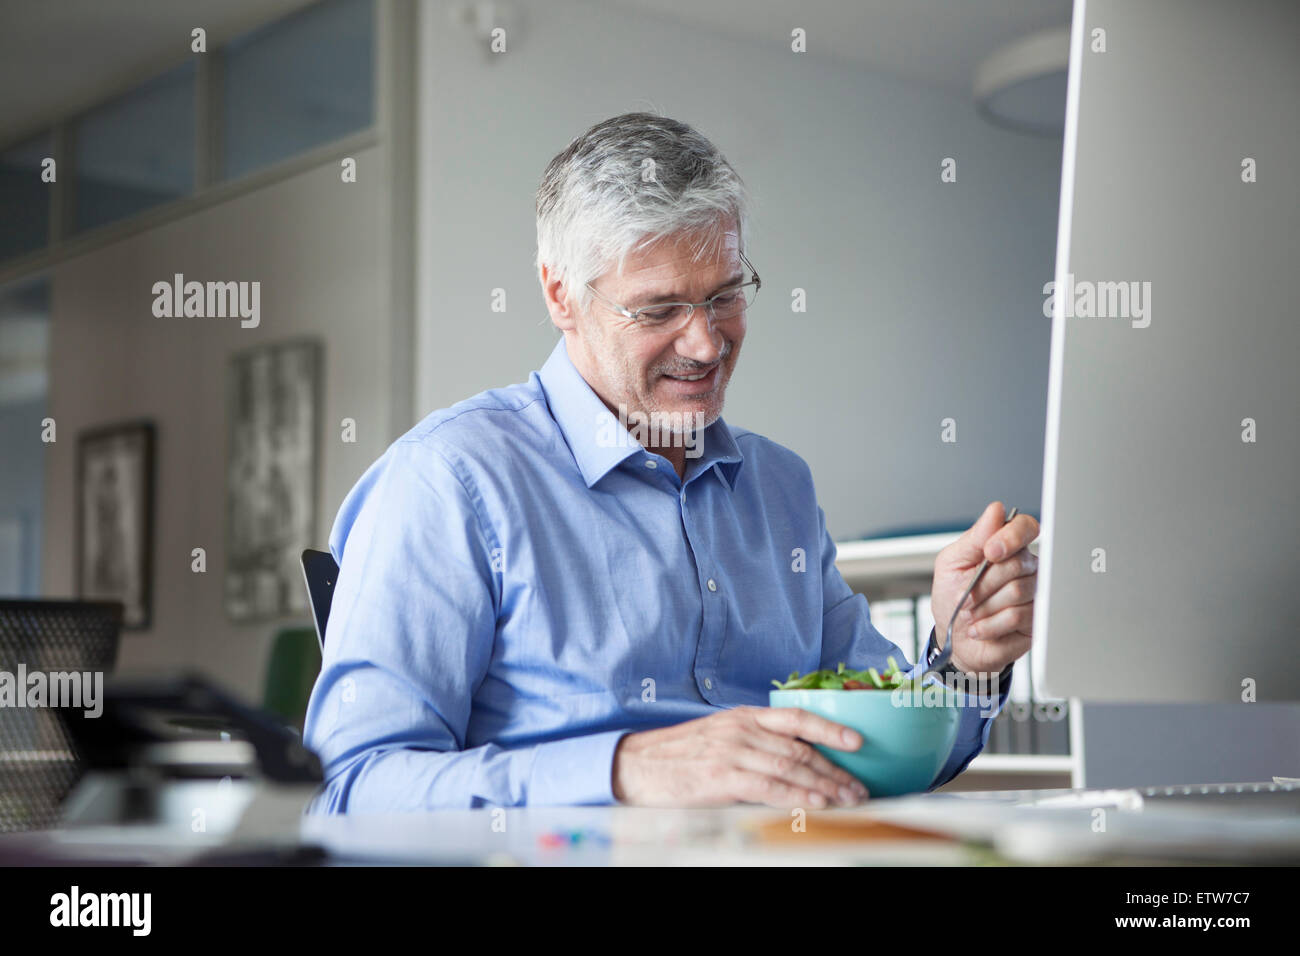 Geschäftsmann am Schreibtisch, Salat essen Stockbild